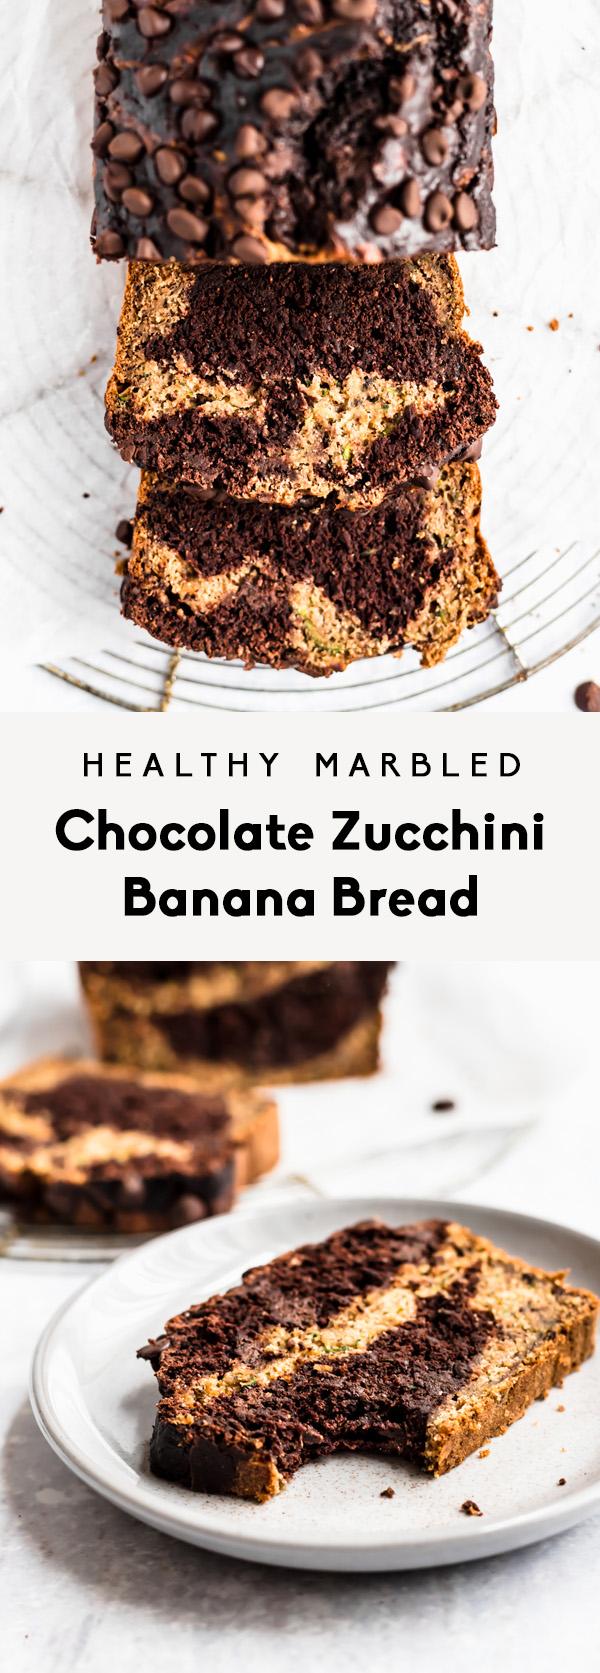 Healthy Marbled Chocolate Zucchini Banana Bread | Recipe ...